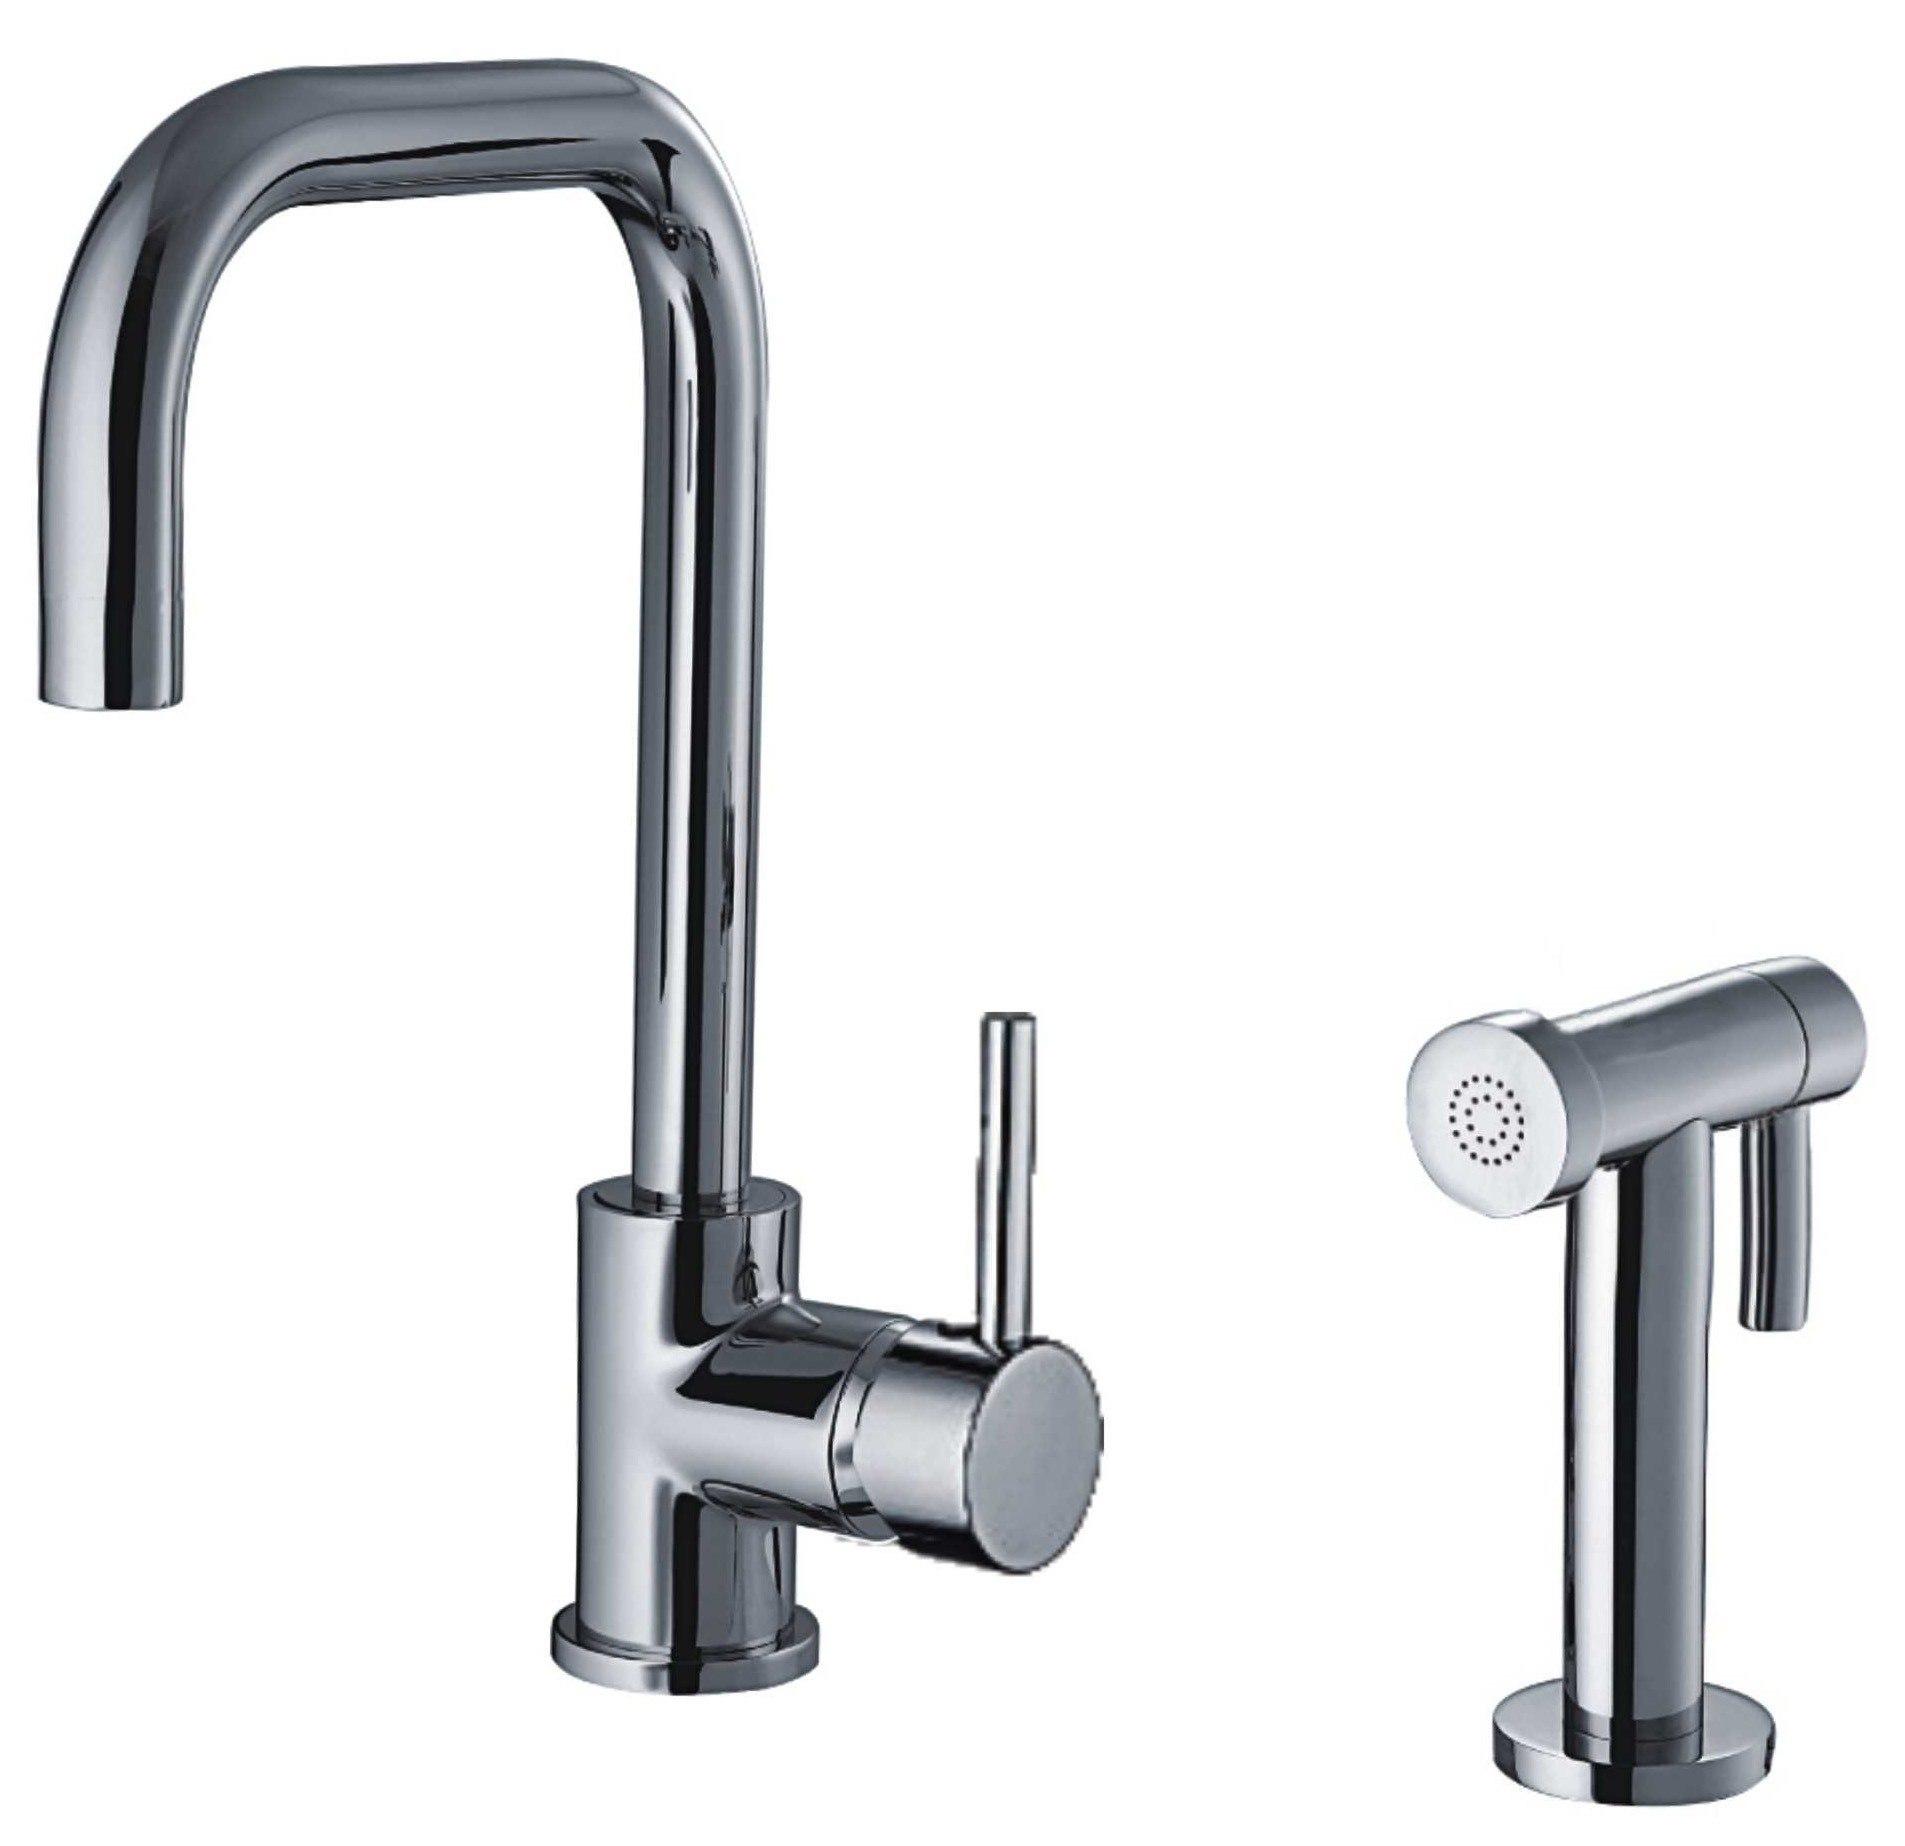 Whitehaus WH2070826 Jem Collection Single Hole/Single Lever Handle Faucet w/ Swivel Spout & Side Spray